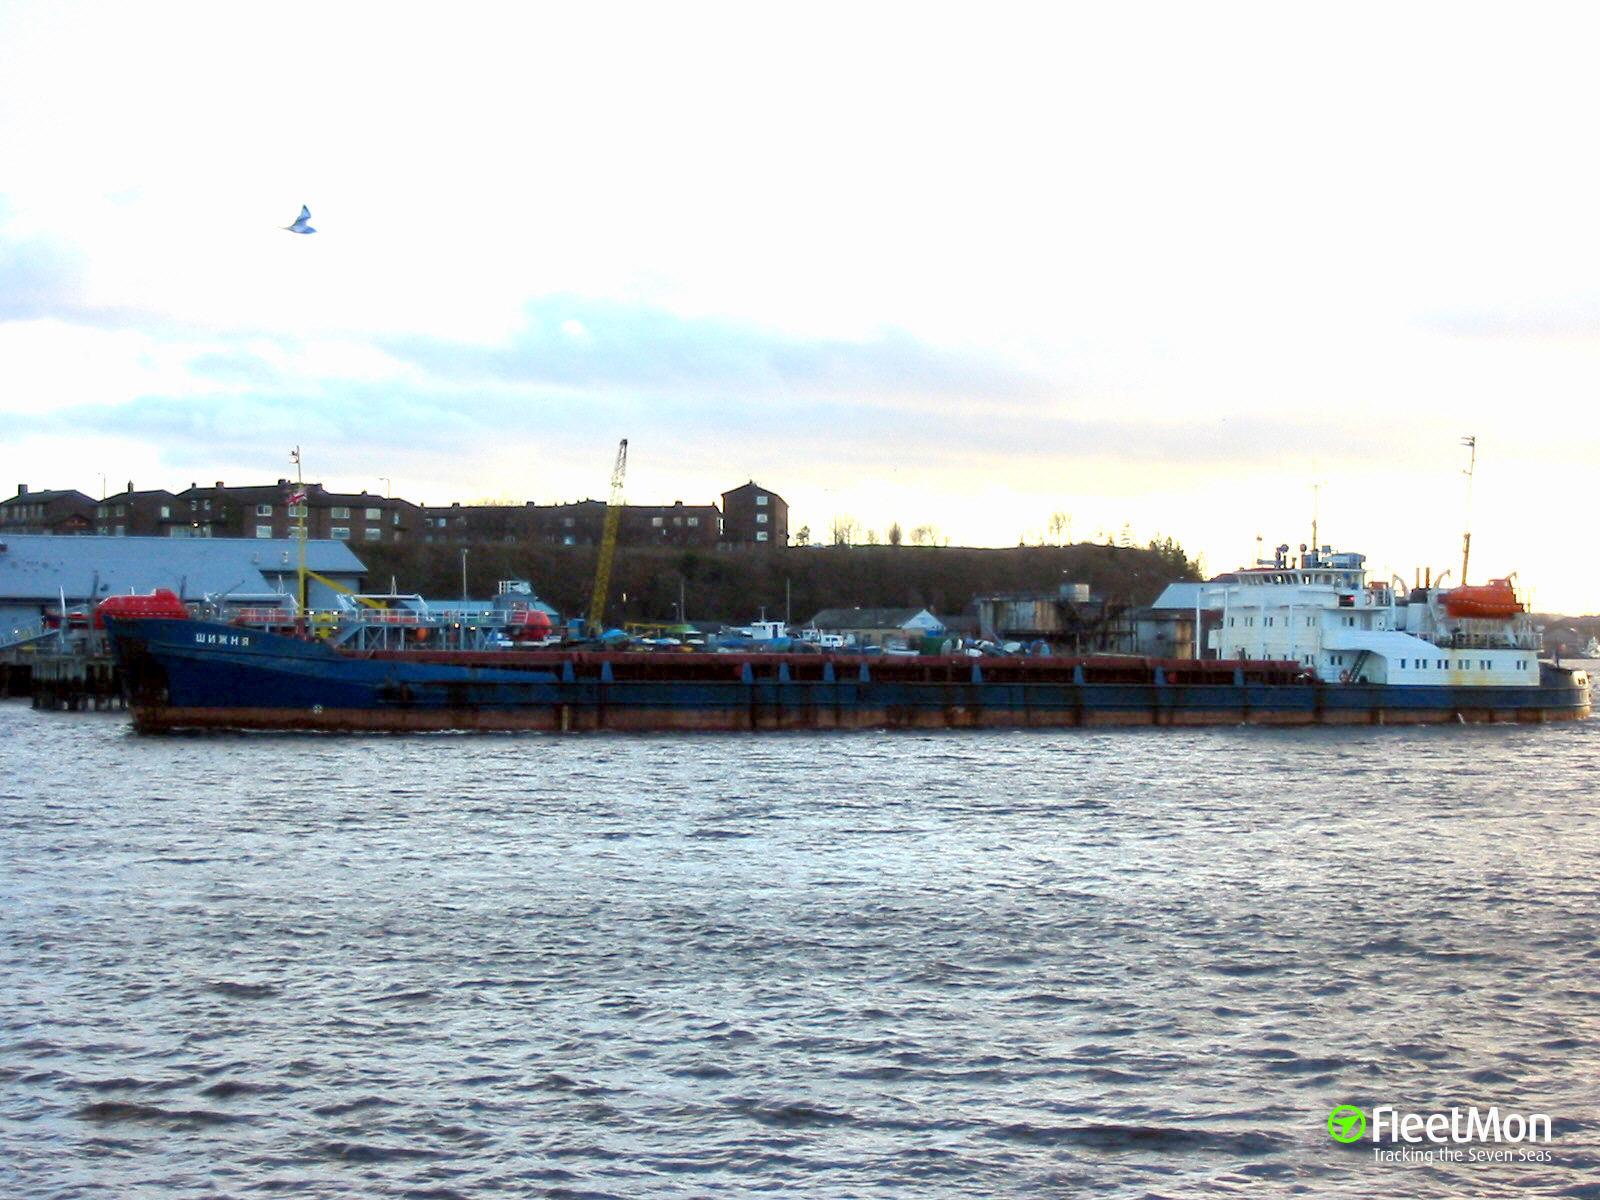 Freighter SHIZHNYA aground, Caspian Sea